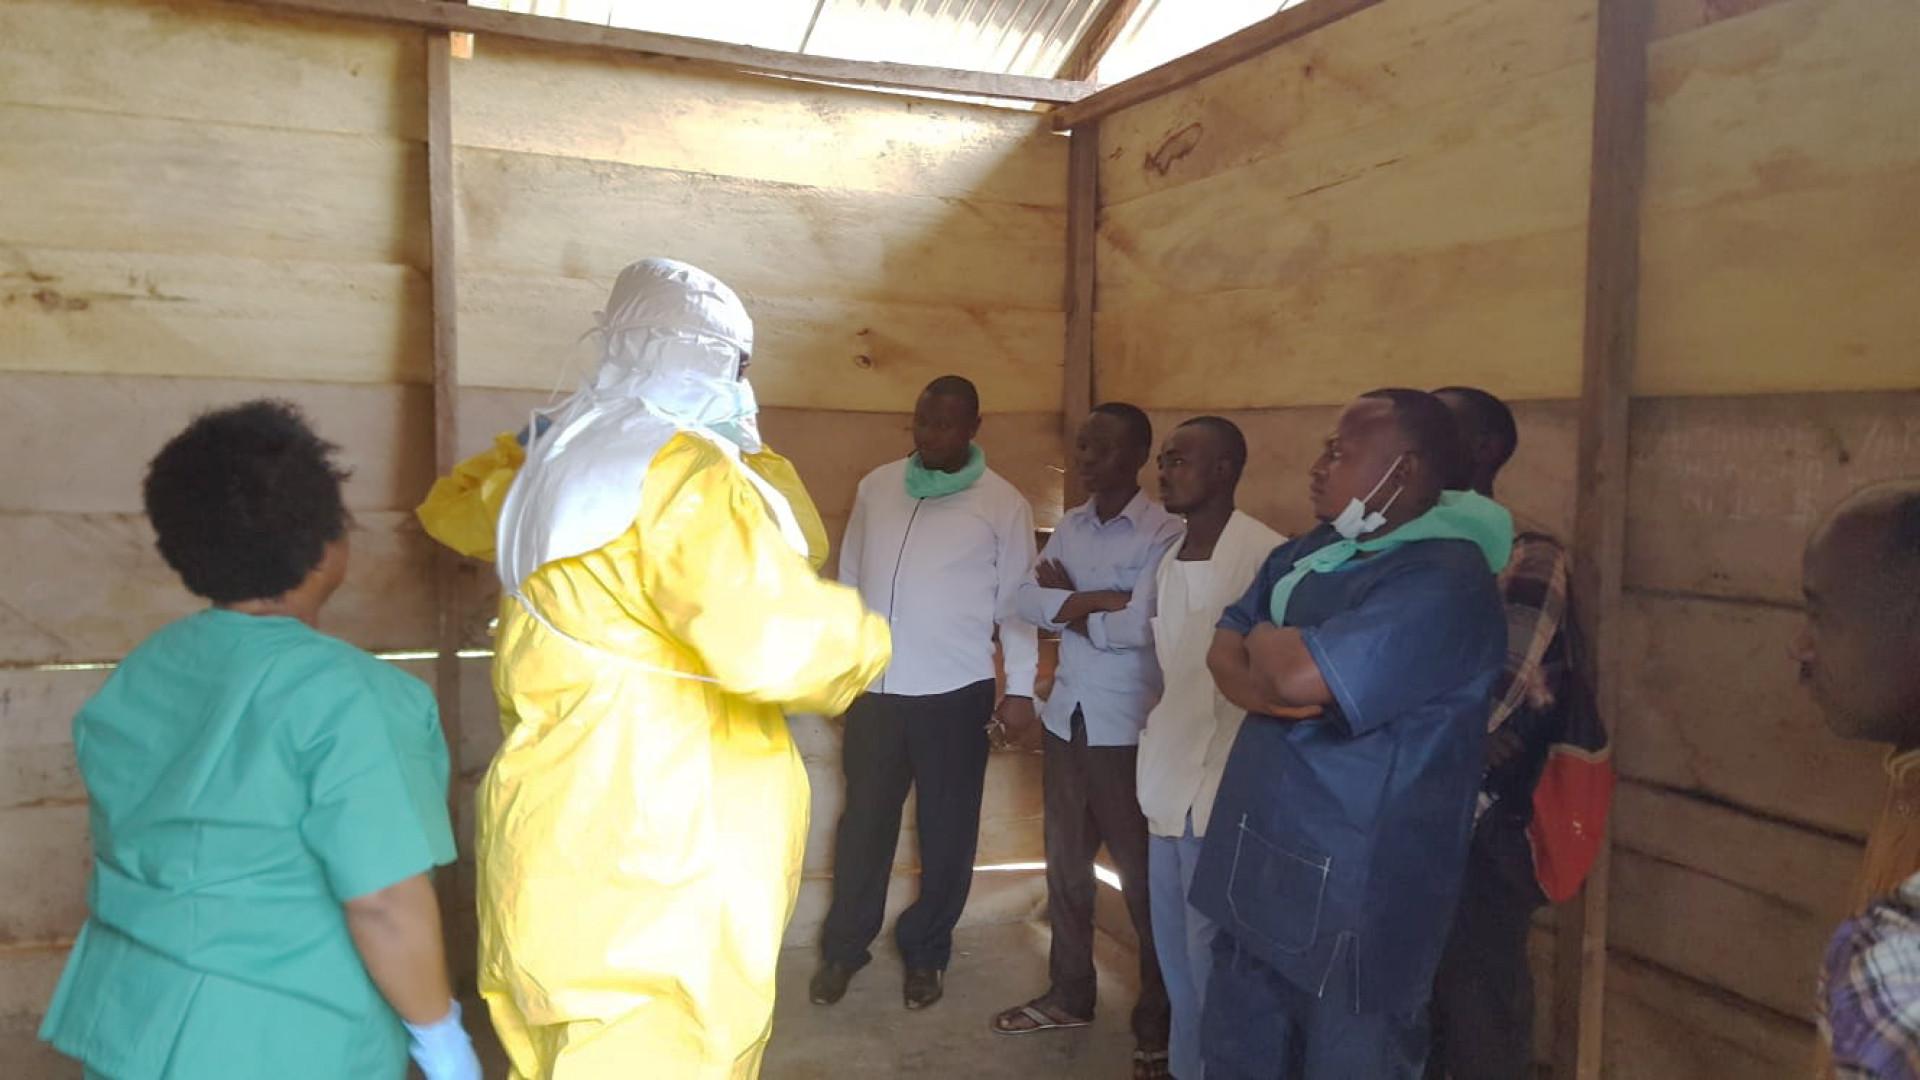 Novo surto de Ébola na RD Congo com 22 casos confirmados